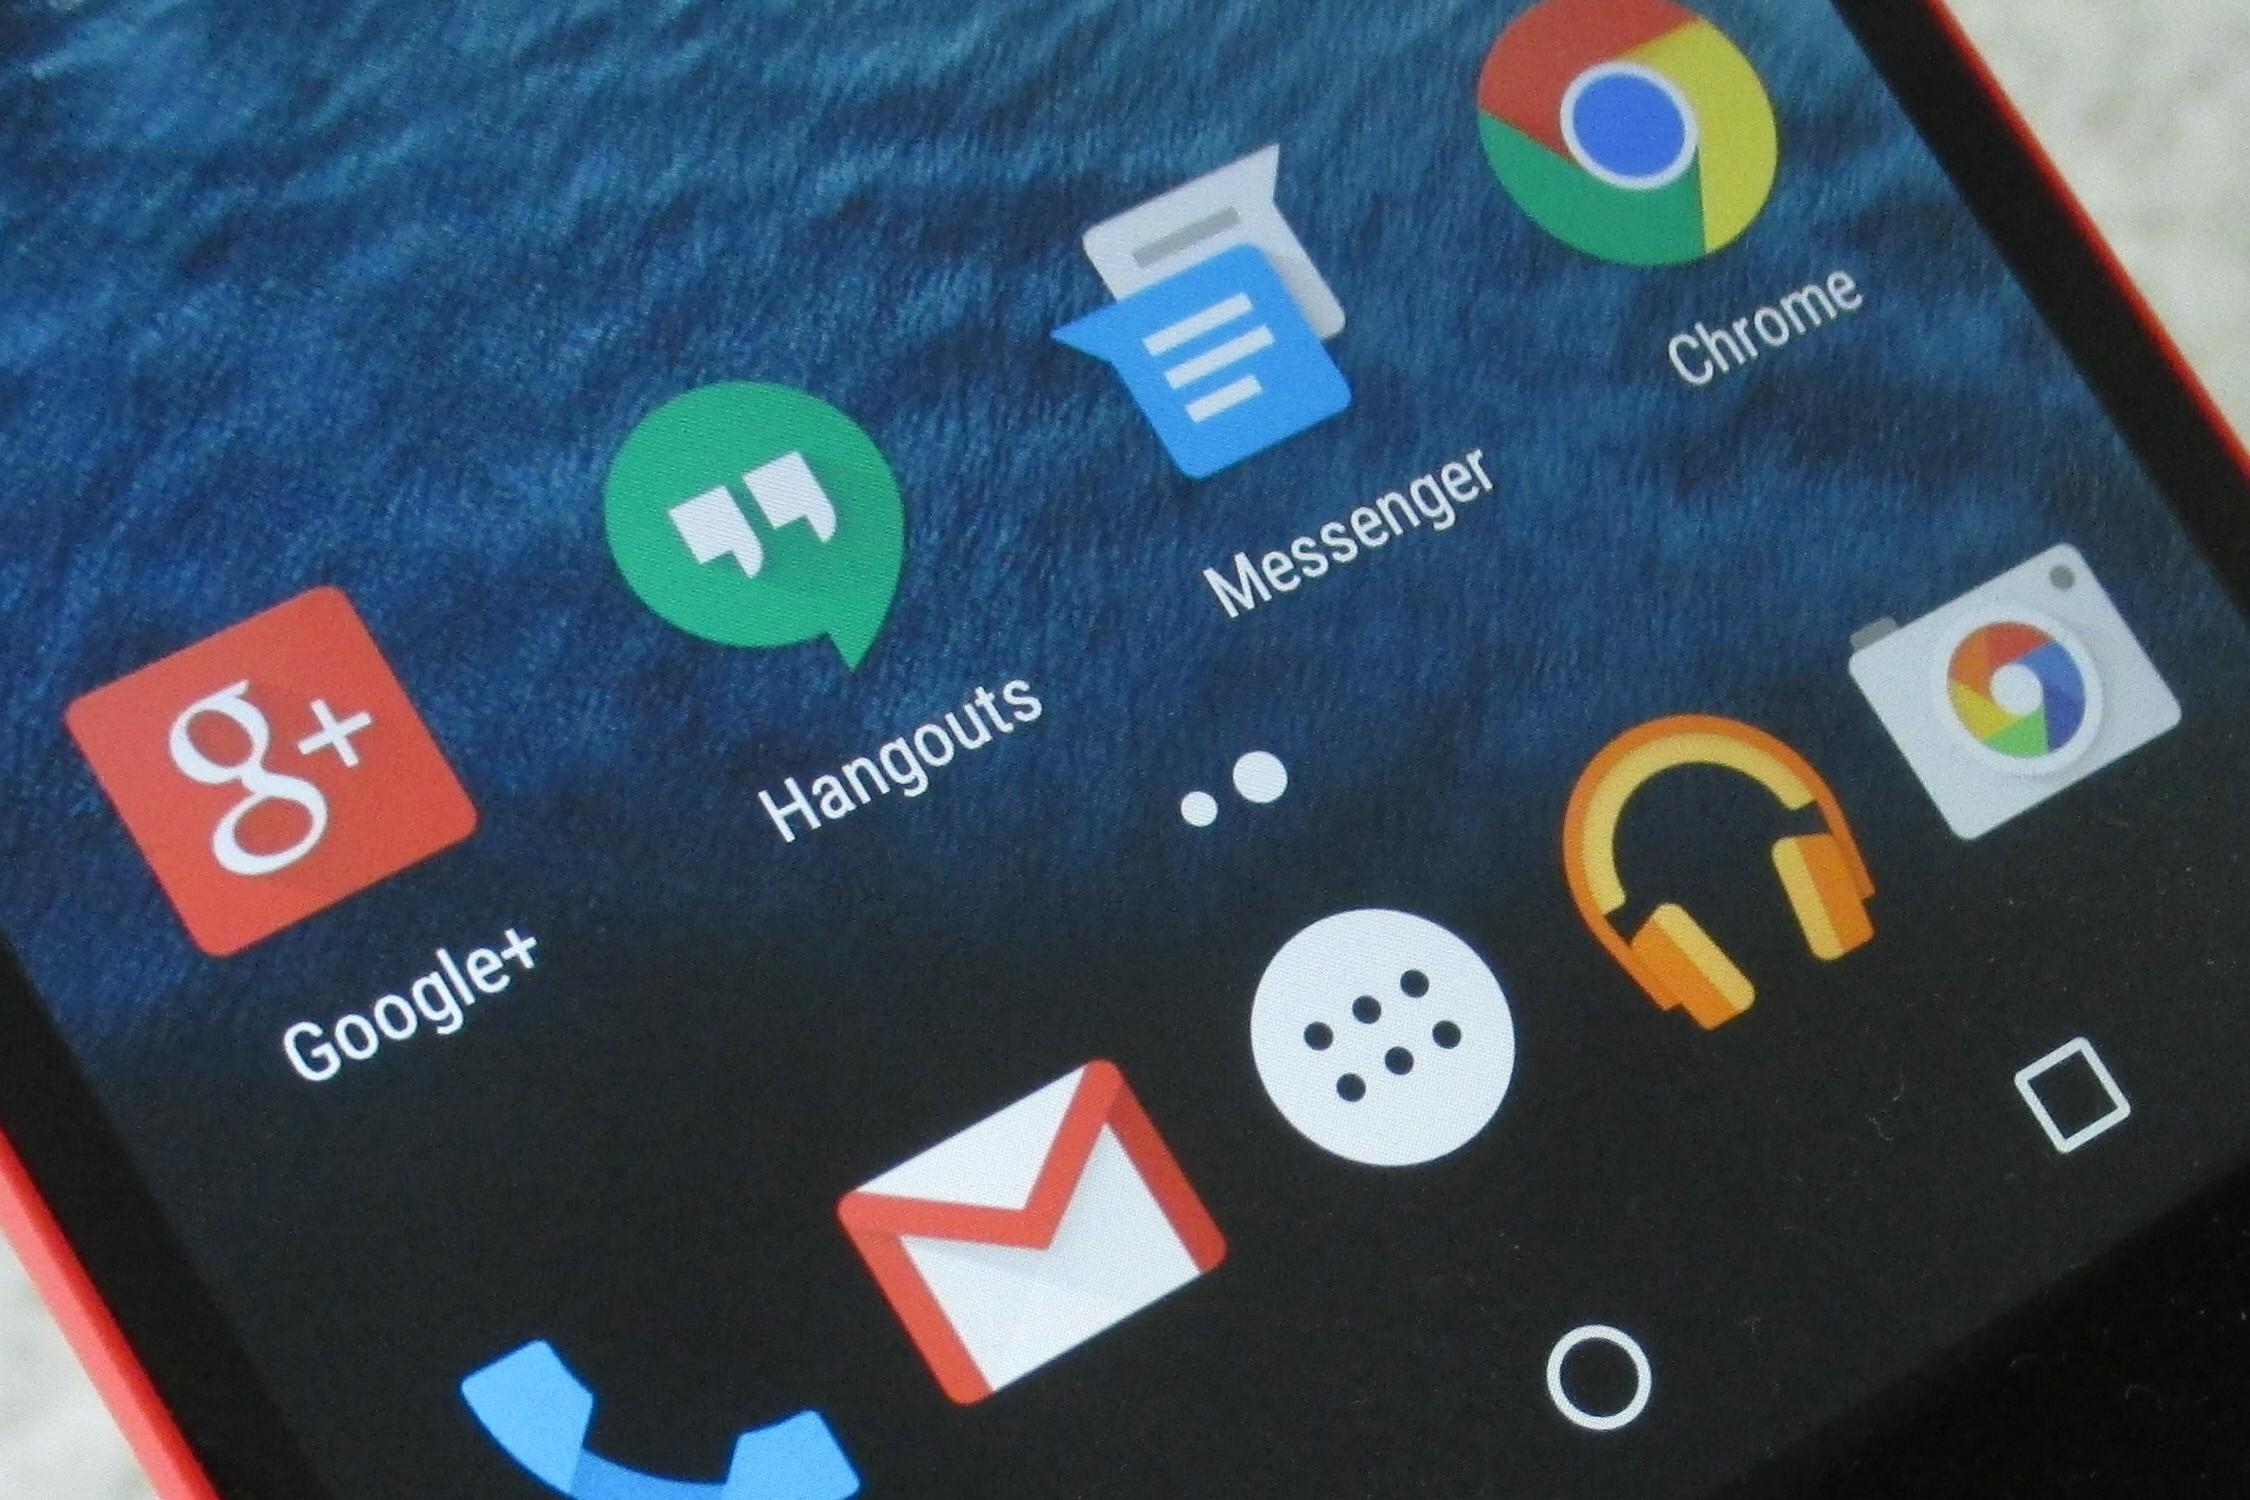 nexus_5_google_hangouts_messenger_icons